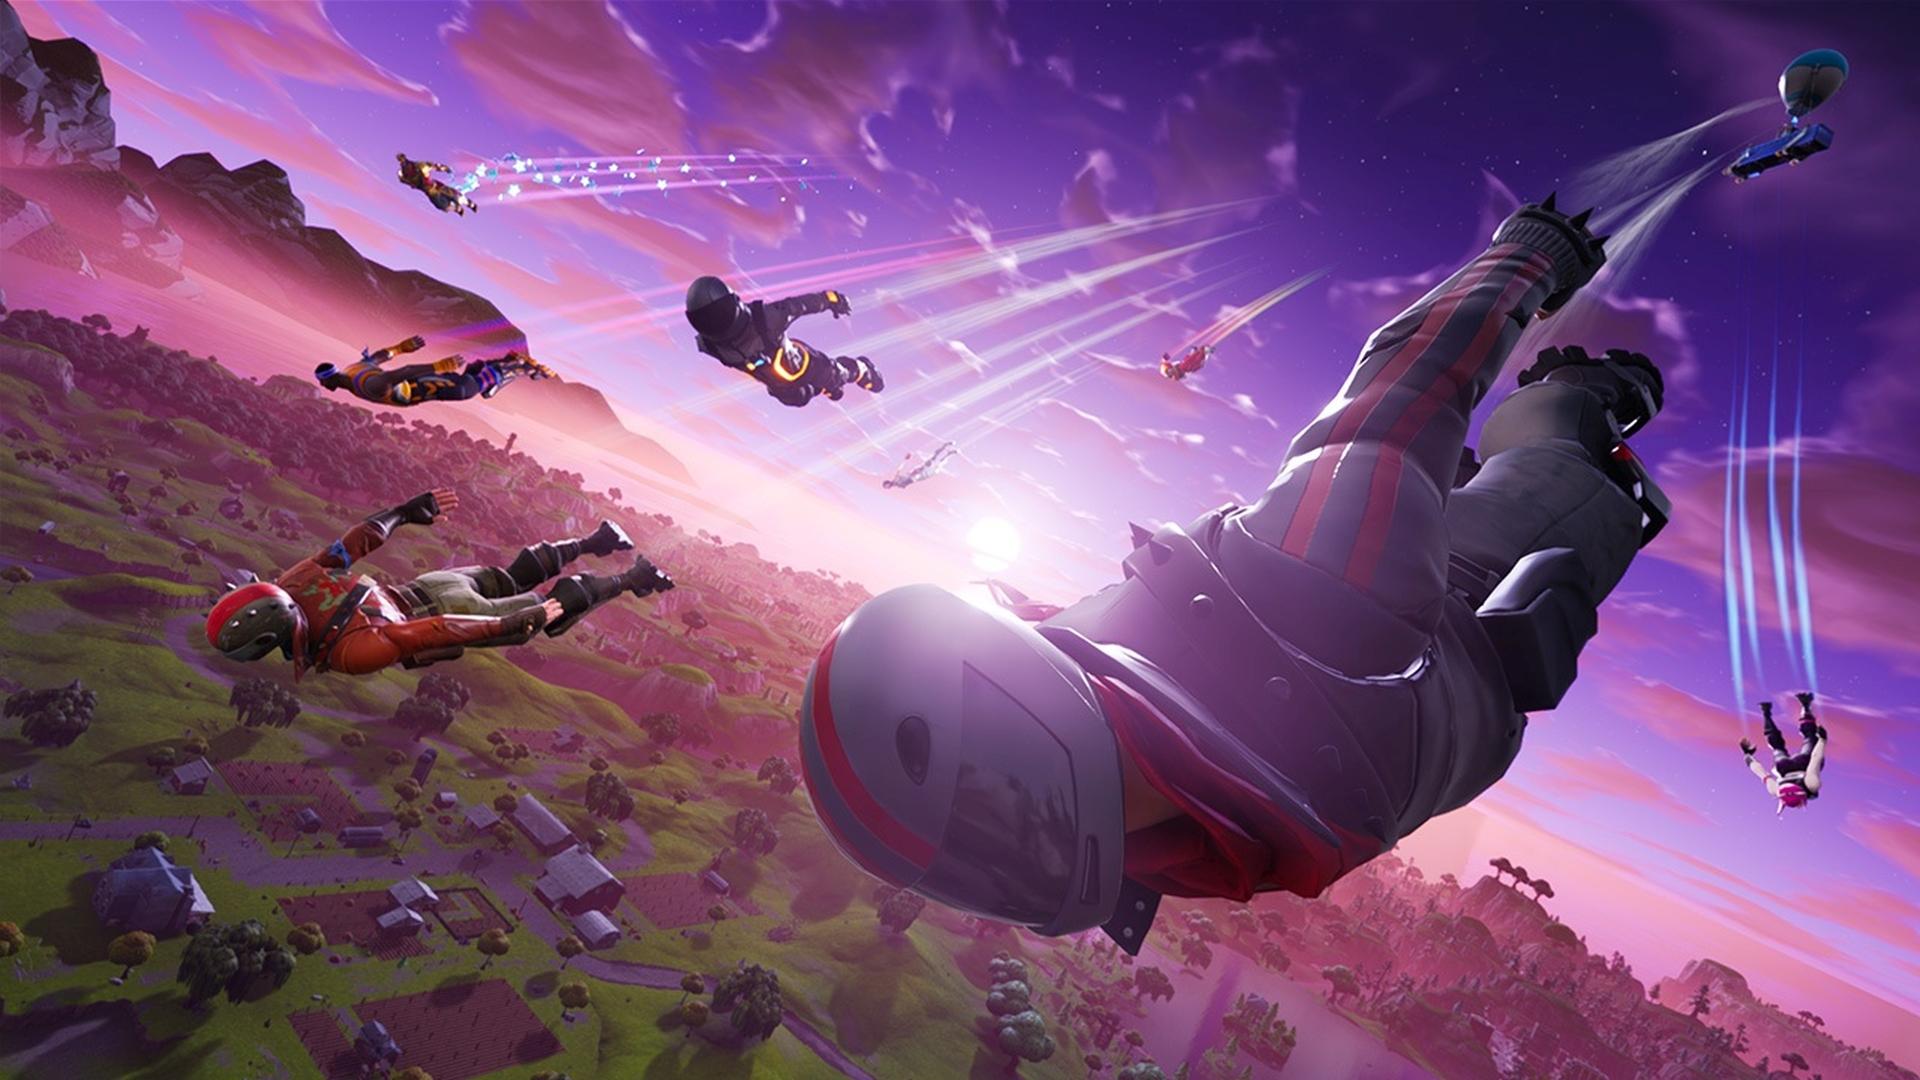 Epic Games - Fortnite